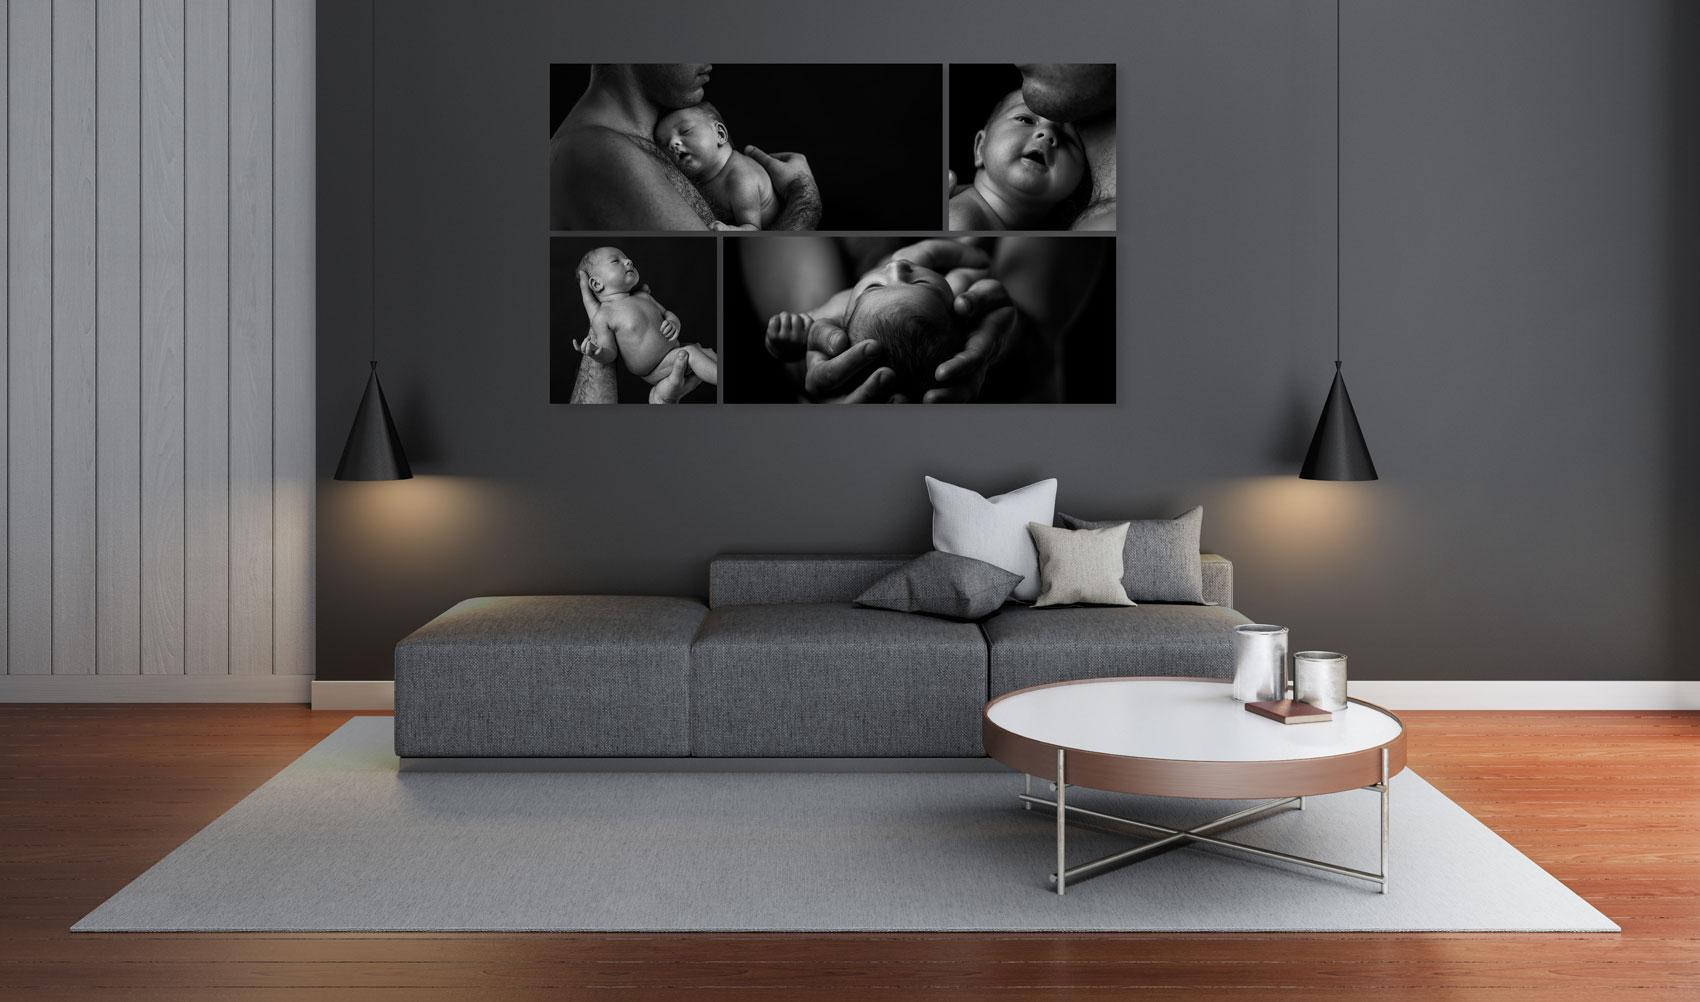 example artwork of portrait photographs